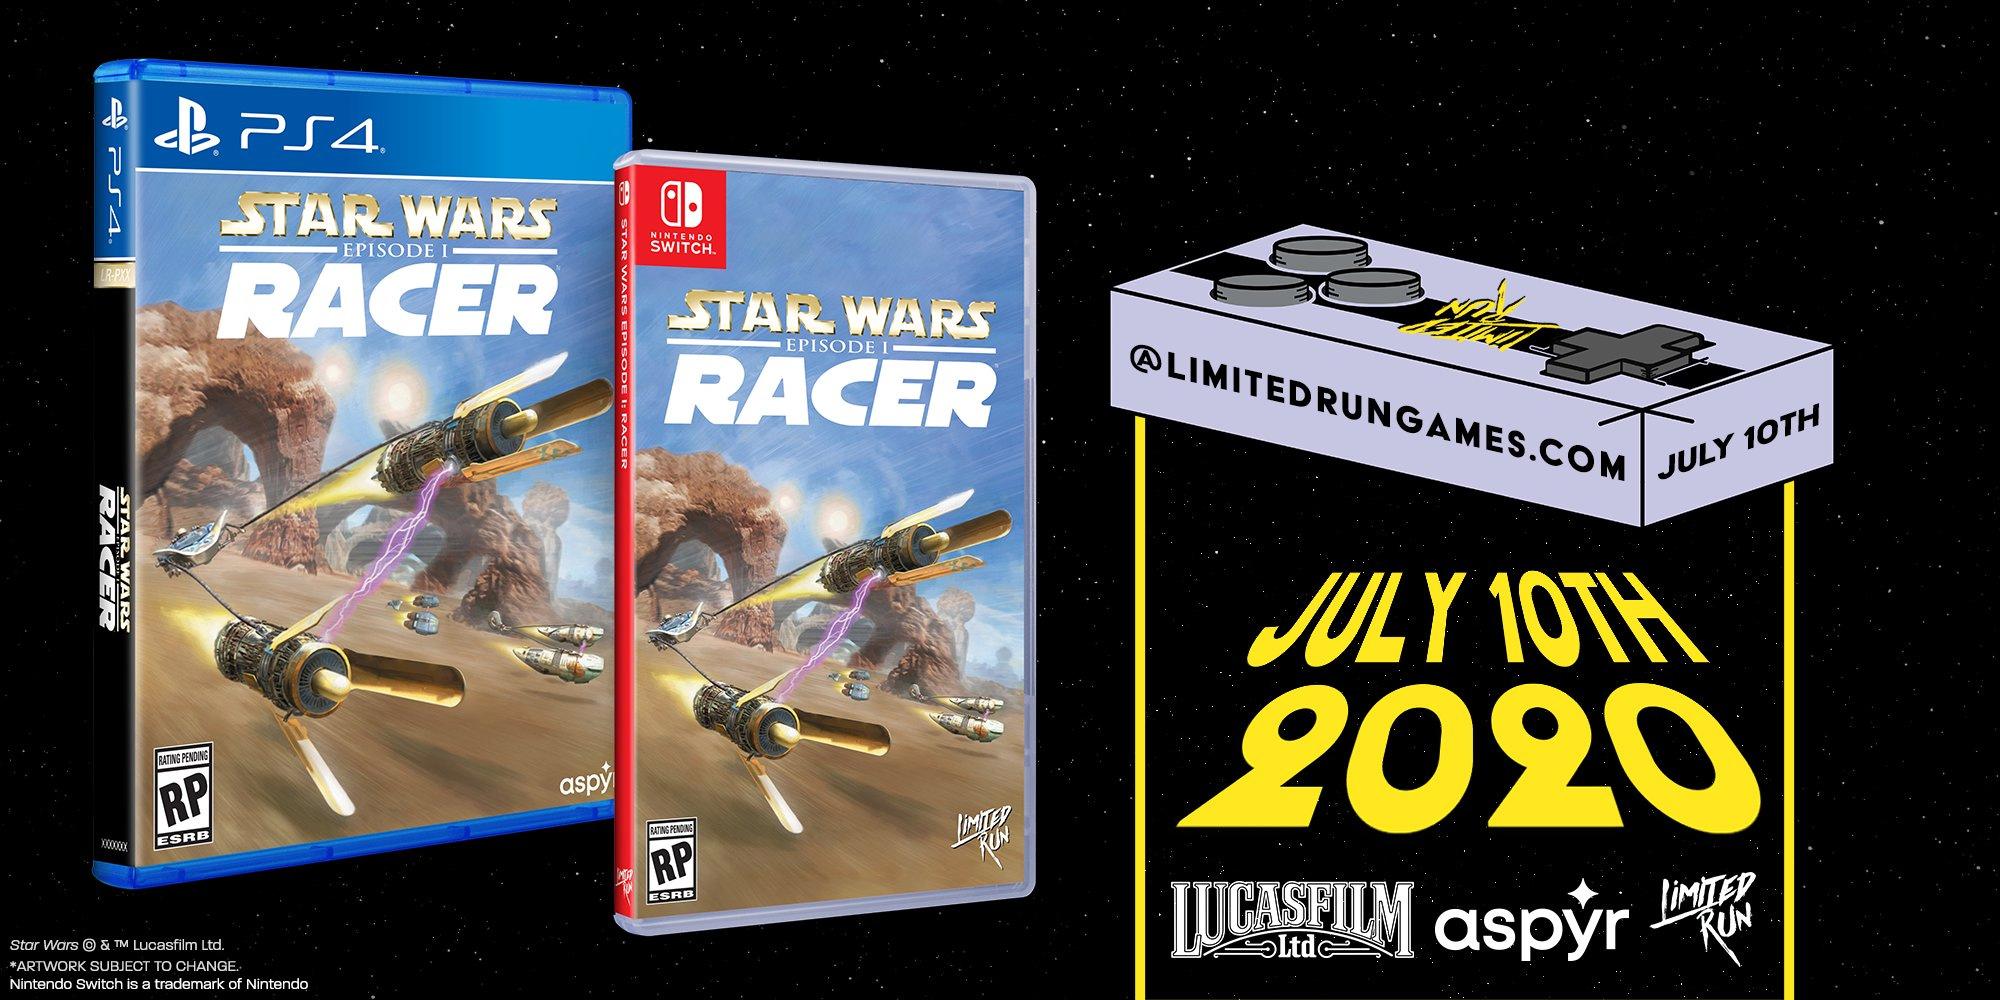 Star Wars Episode I: Racer standard edition Limited Run Games